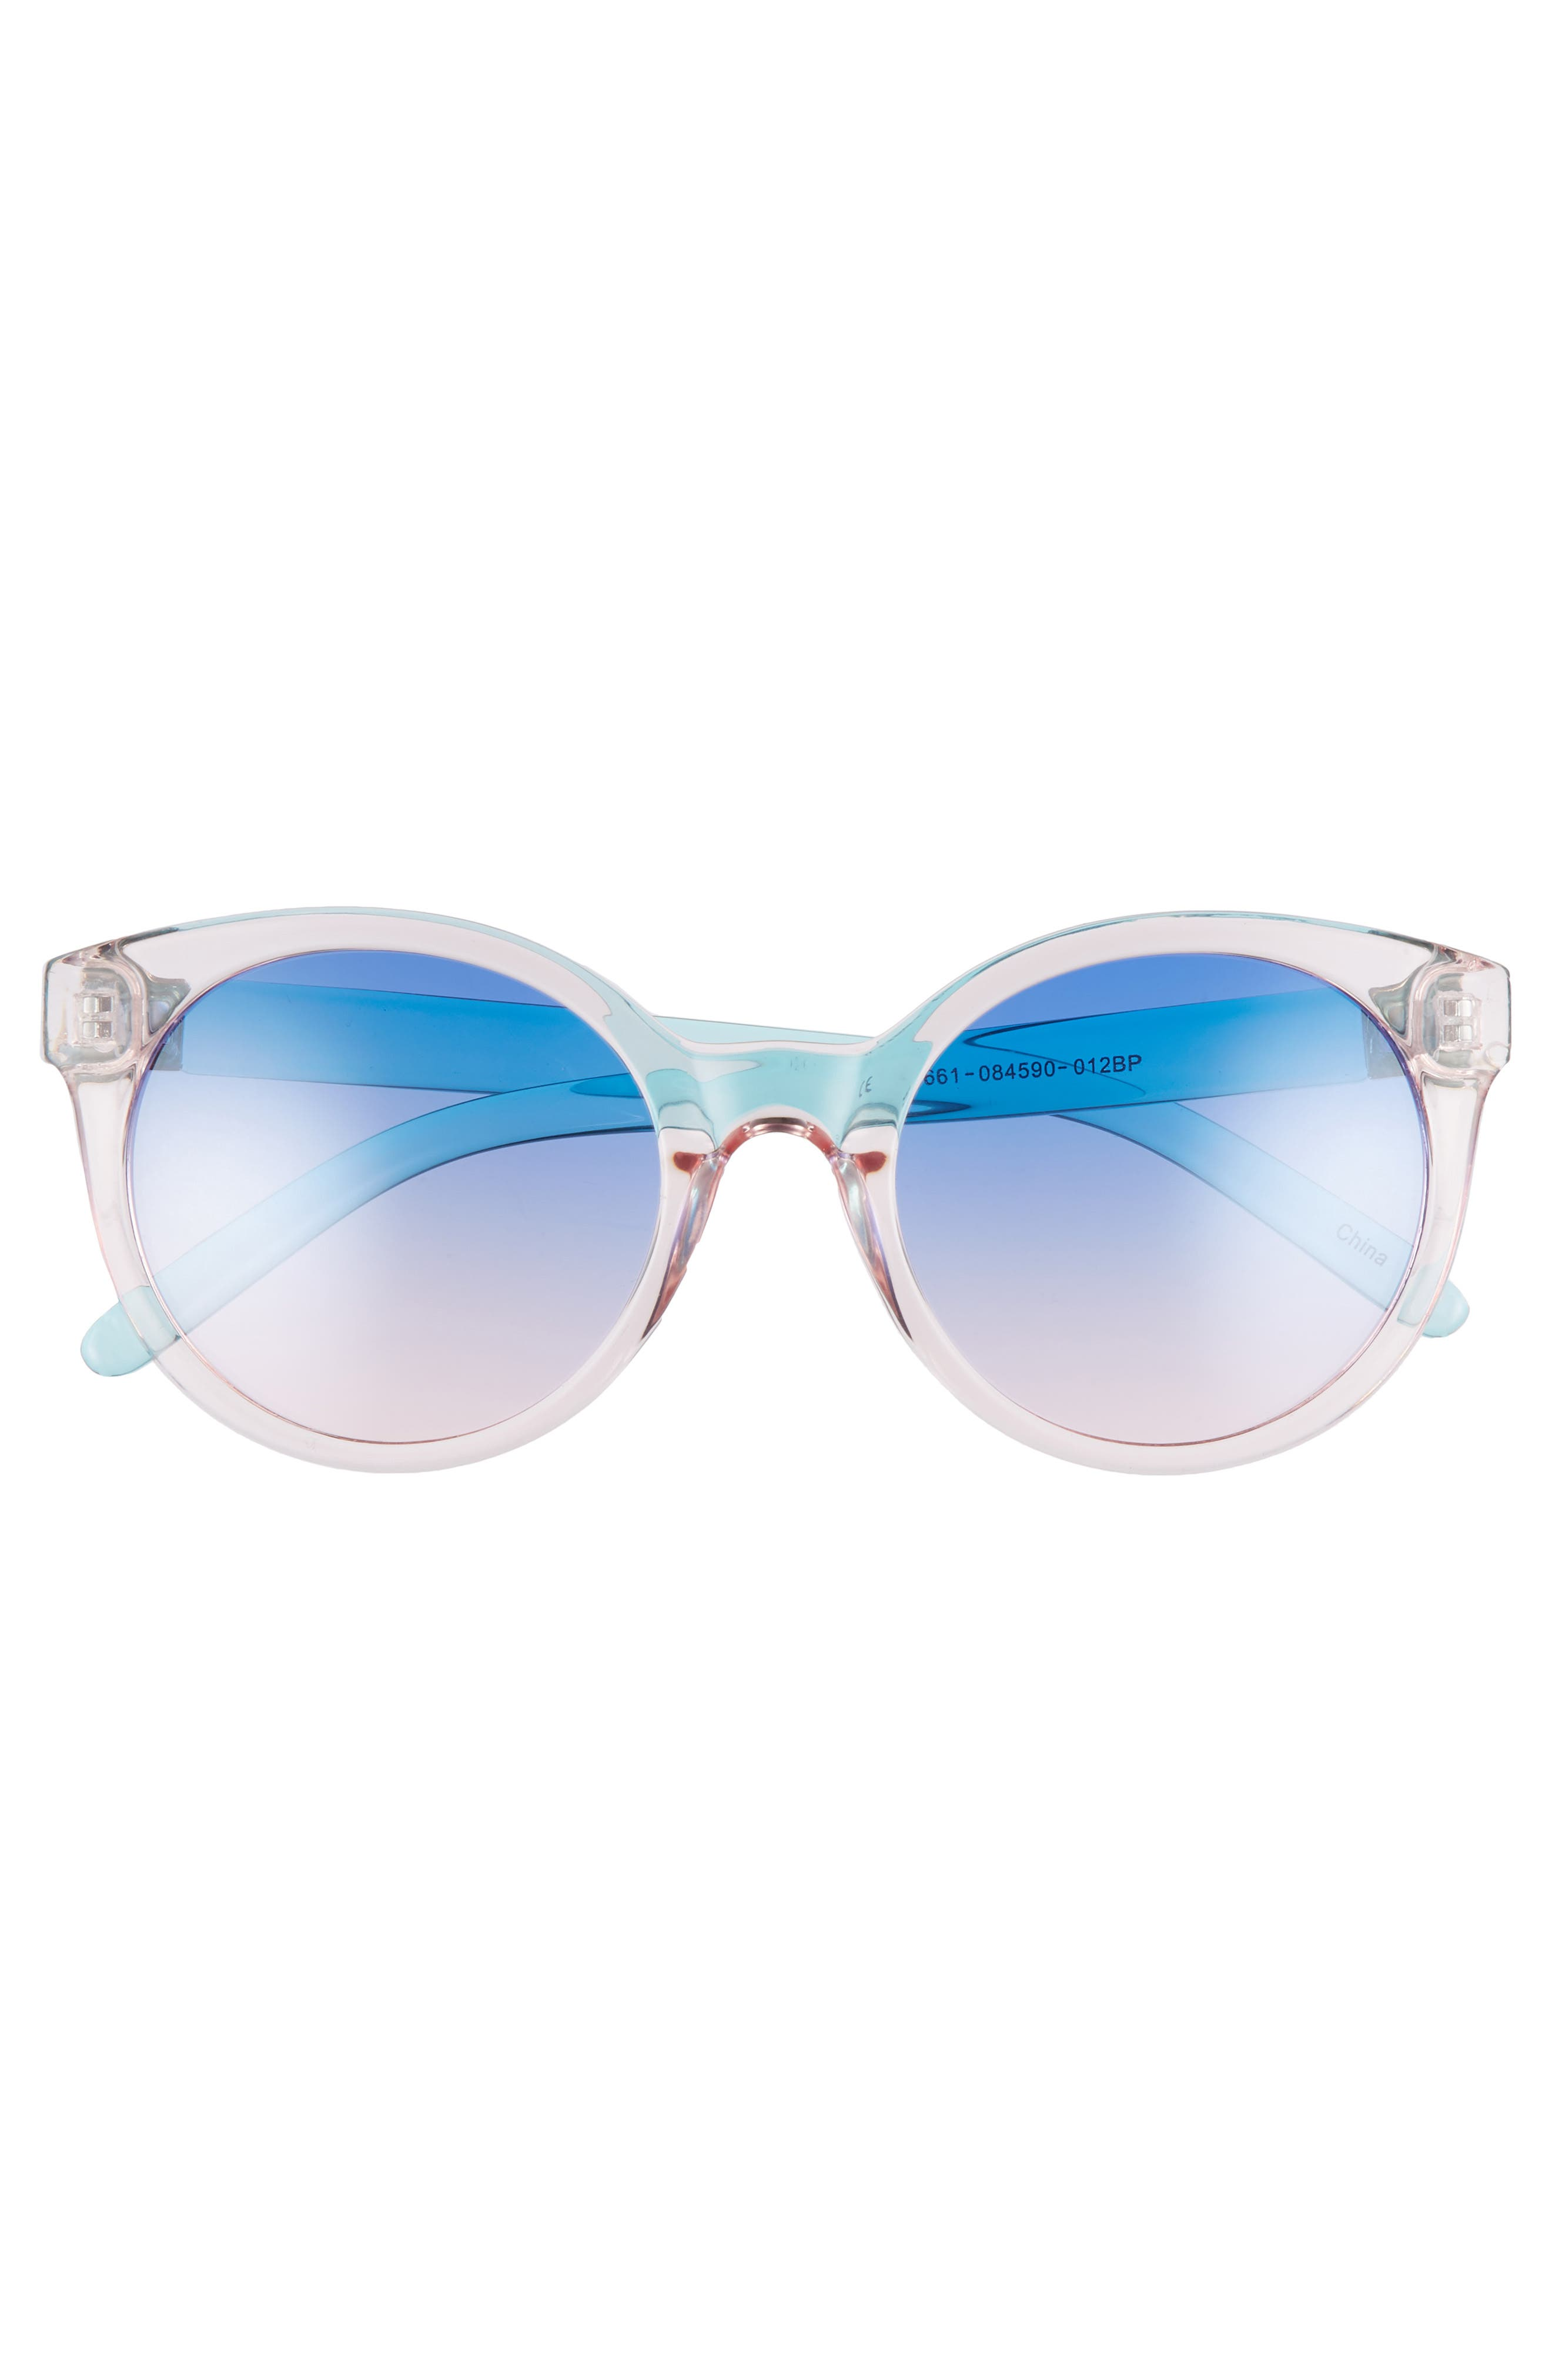 Transparent Round Sunglasses,                             Alternate thumbnail 3, color,                             100